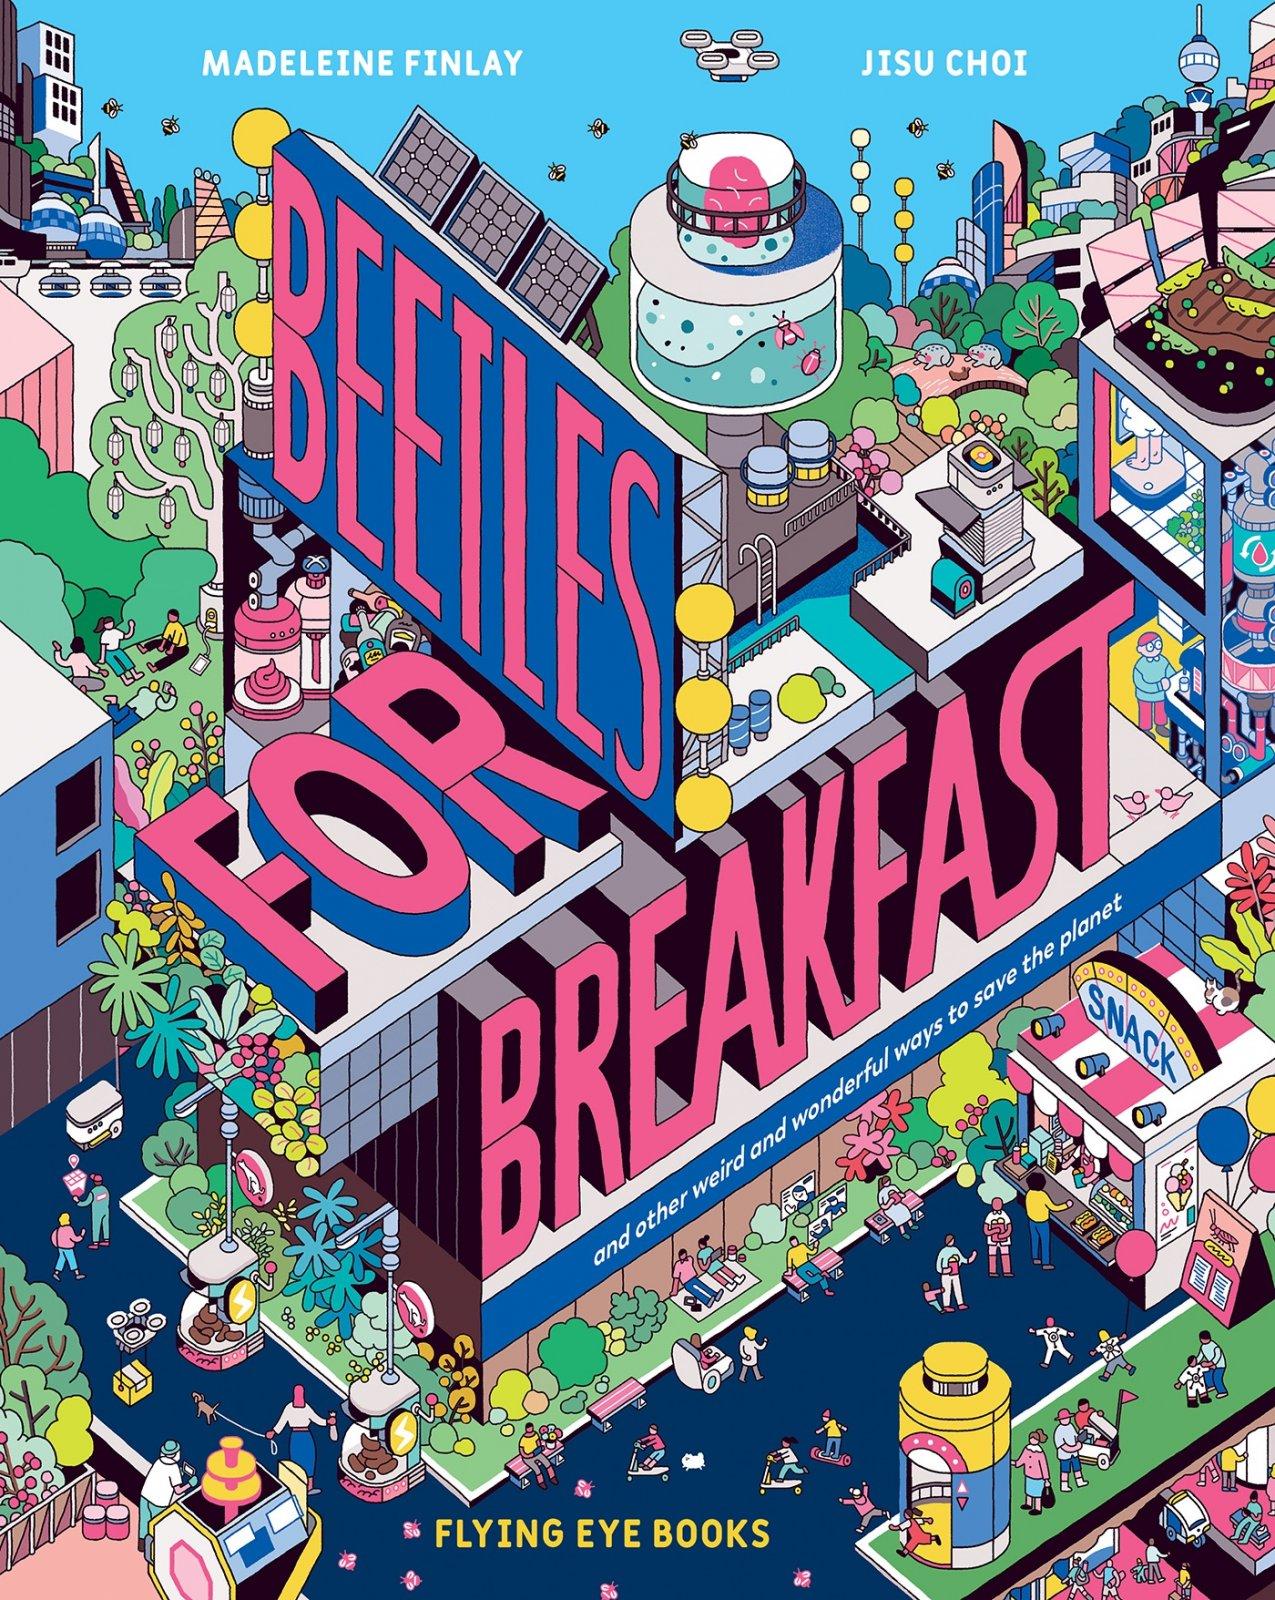 Beetles For Breakfast by Madeleine Finlay and Jisu Choi